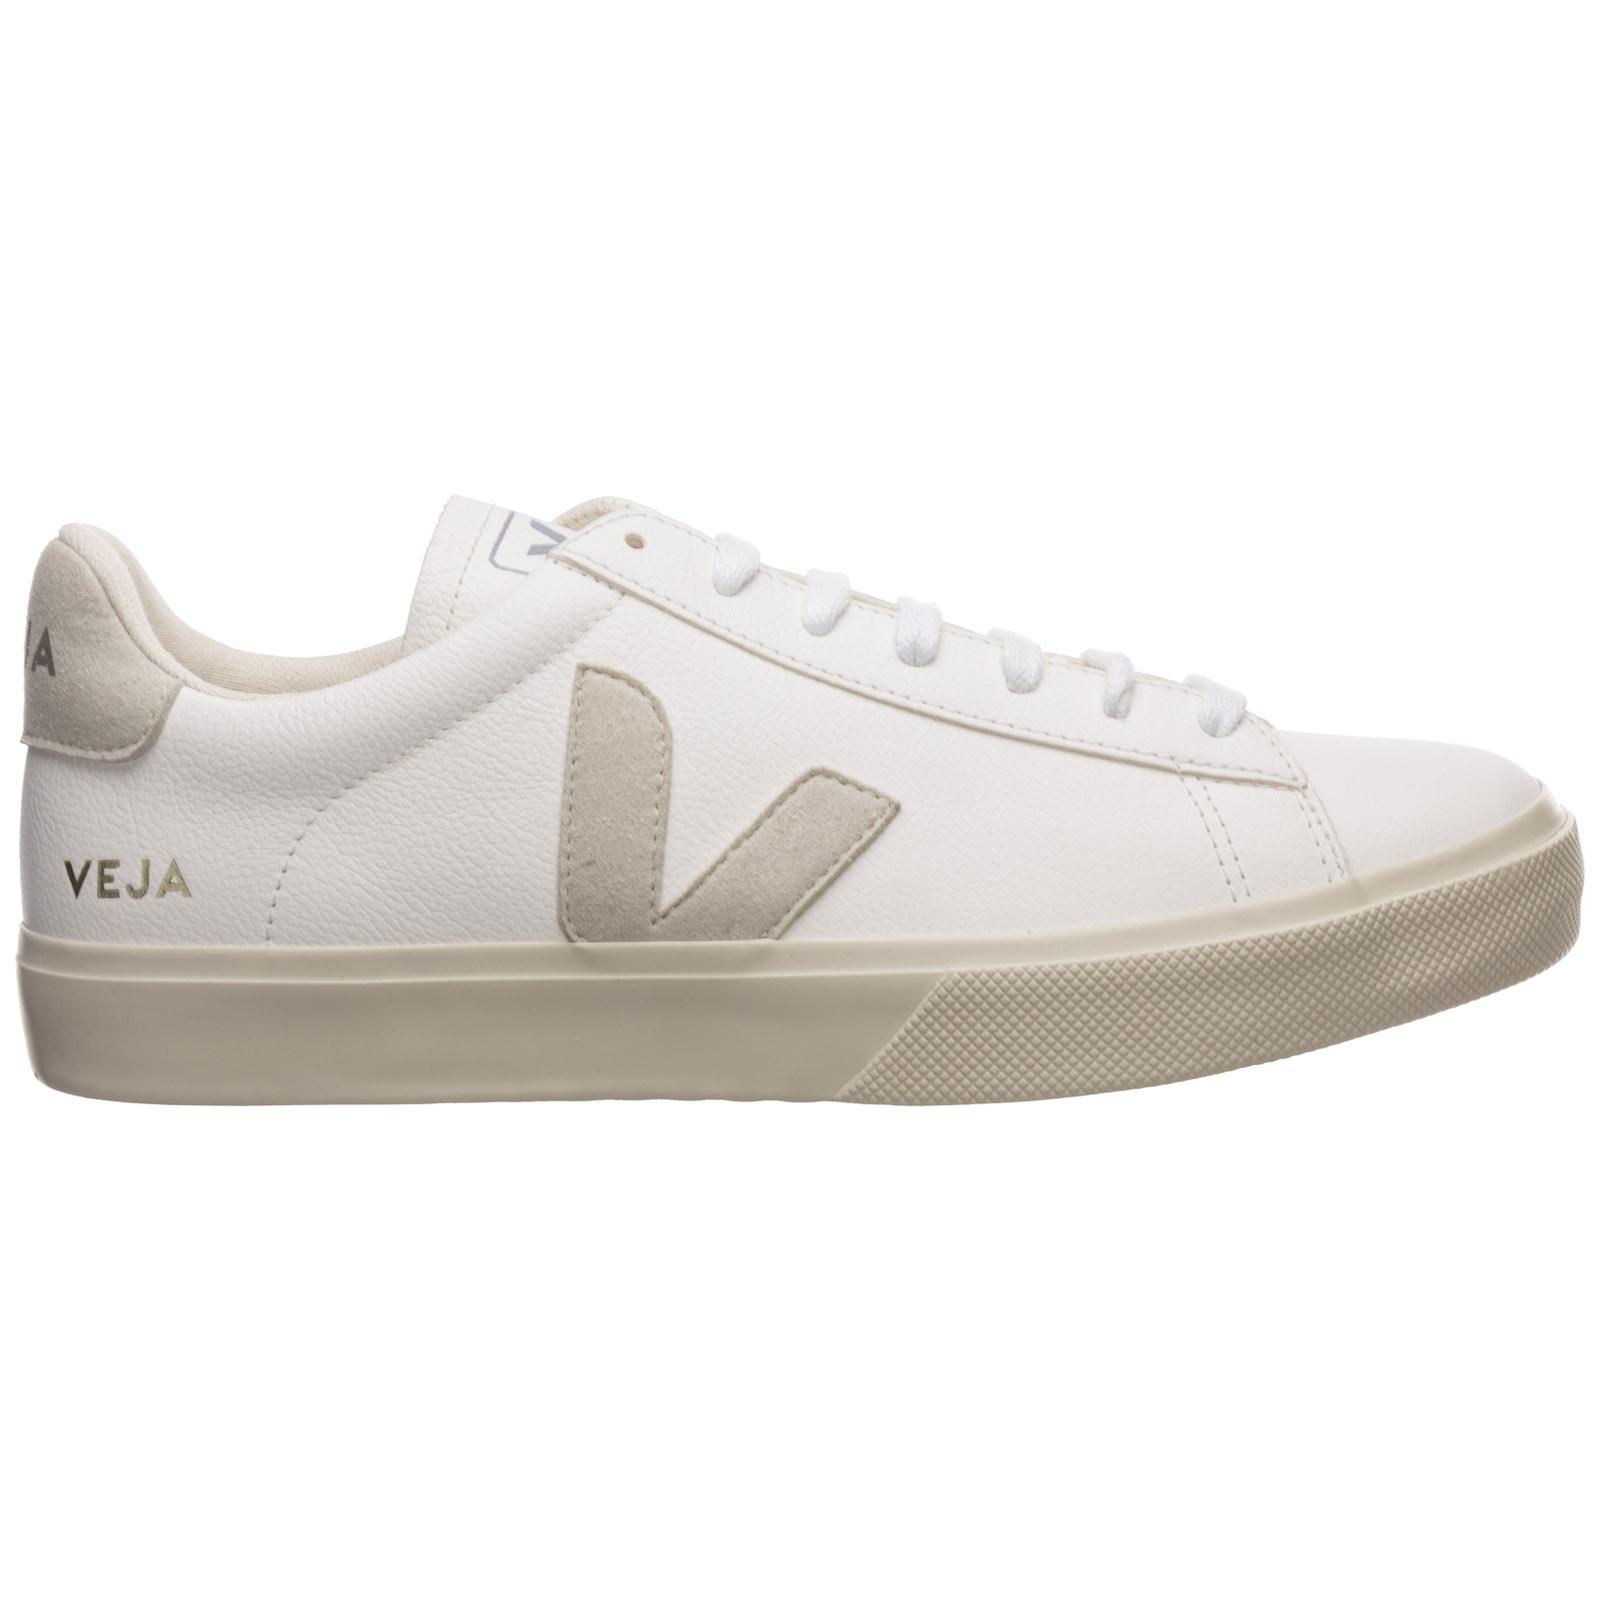 Cubo Cadera Cantidad de dinero  Sneakers Veja campo CP051945 white natural | FRMODA.com